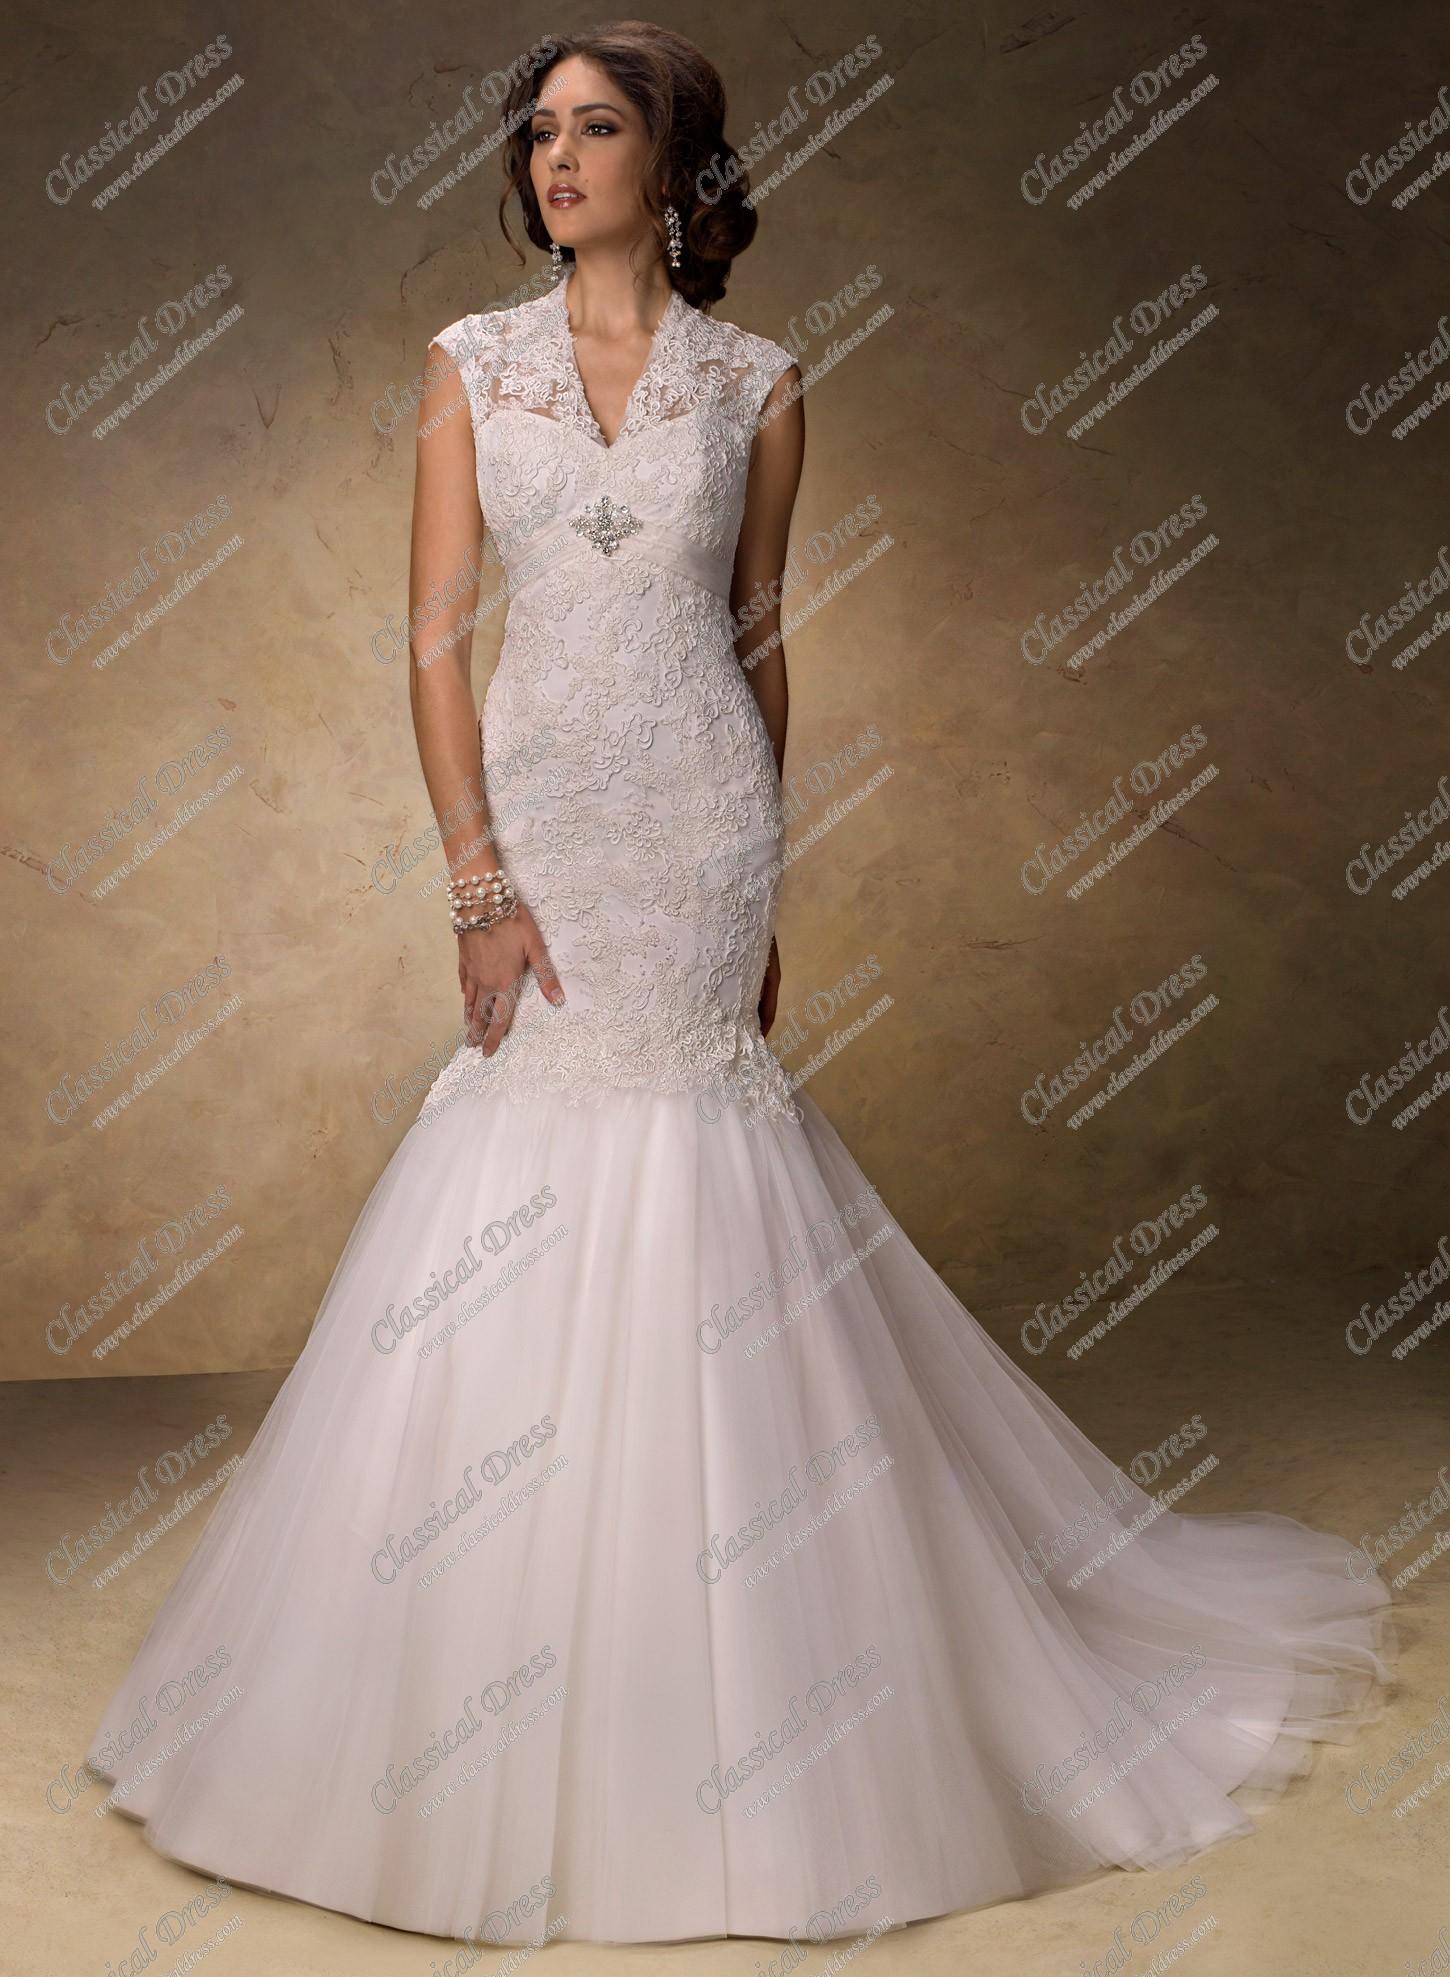 Maggie sottero wedding dresses cheap wedding dresses in for Cheap wedding dresses ebay